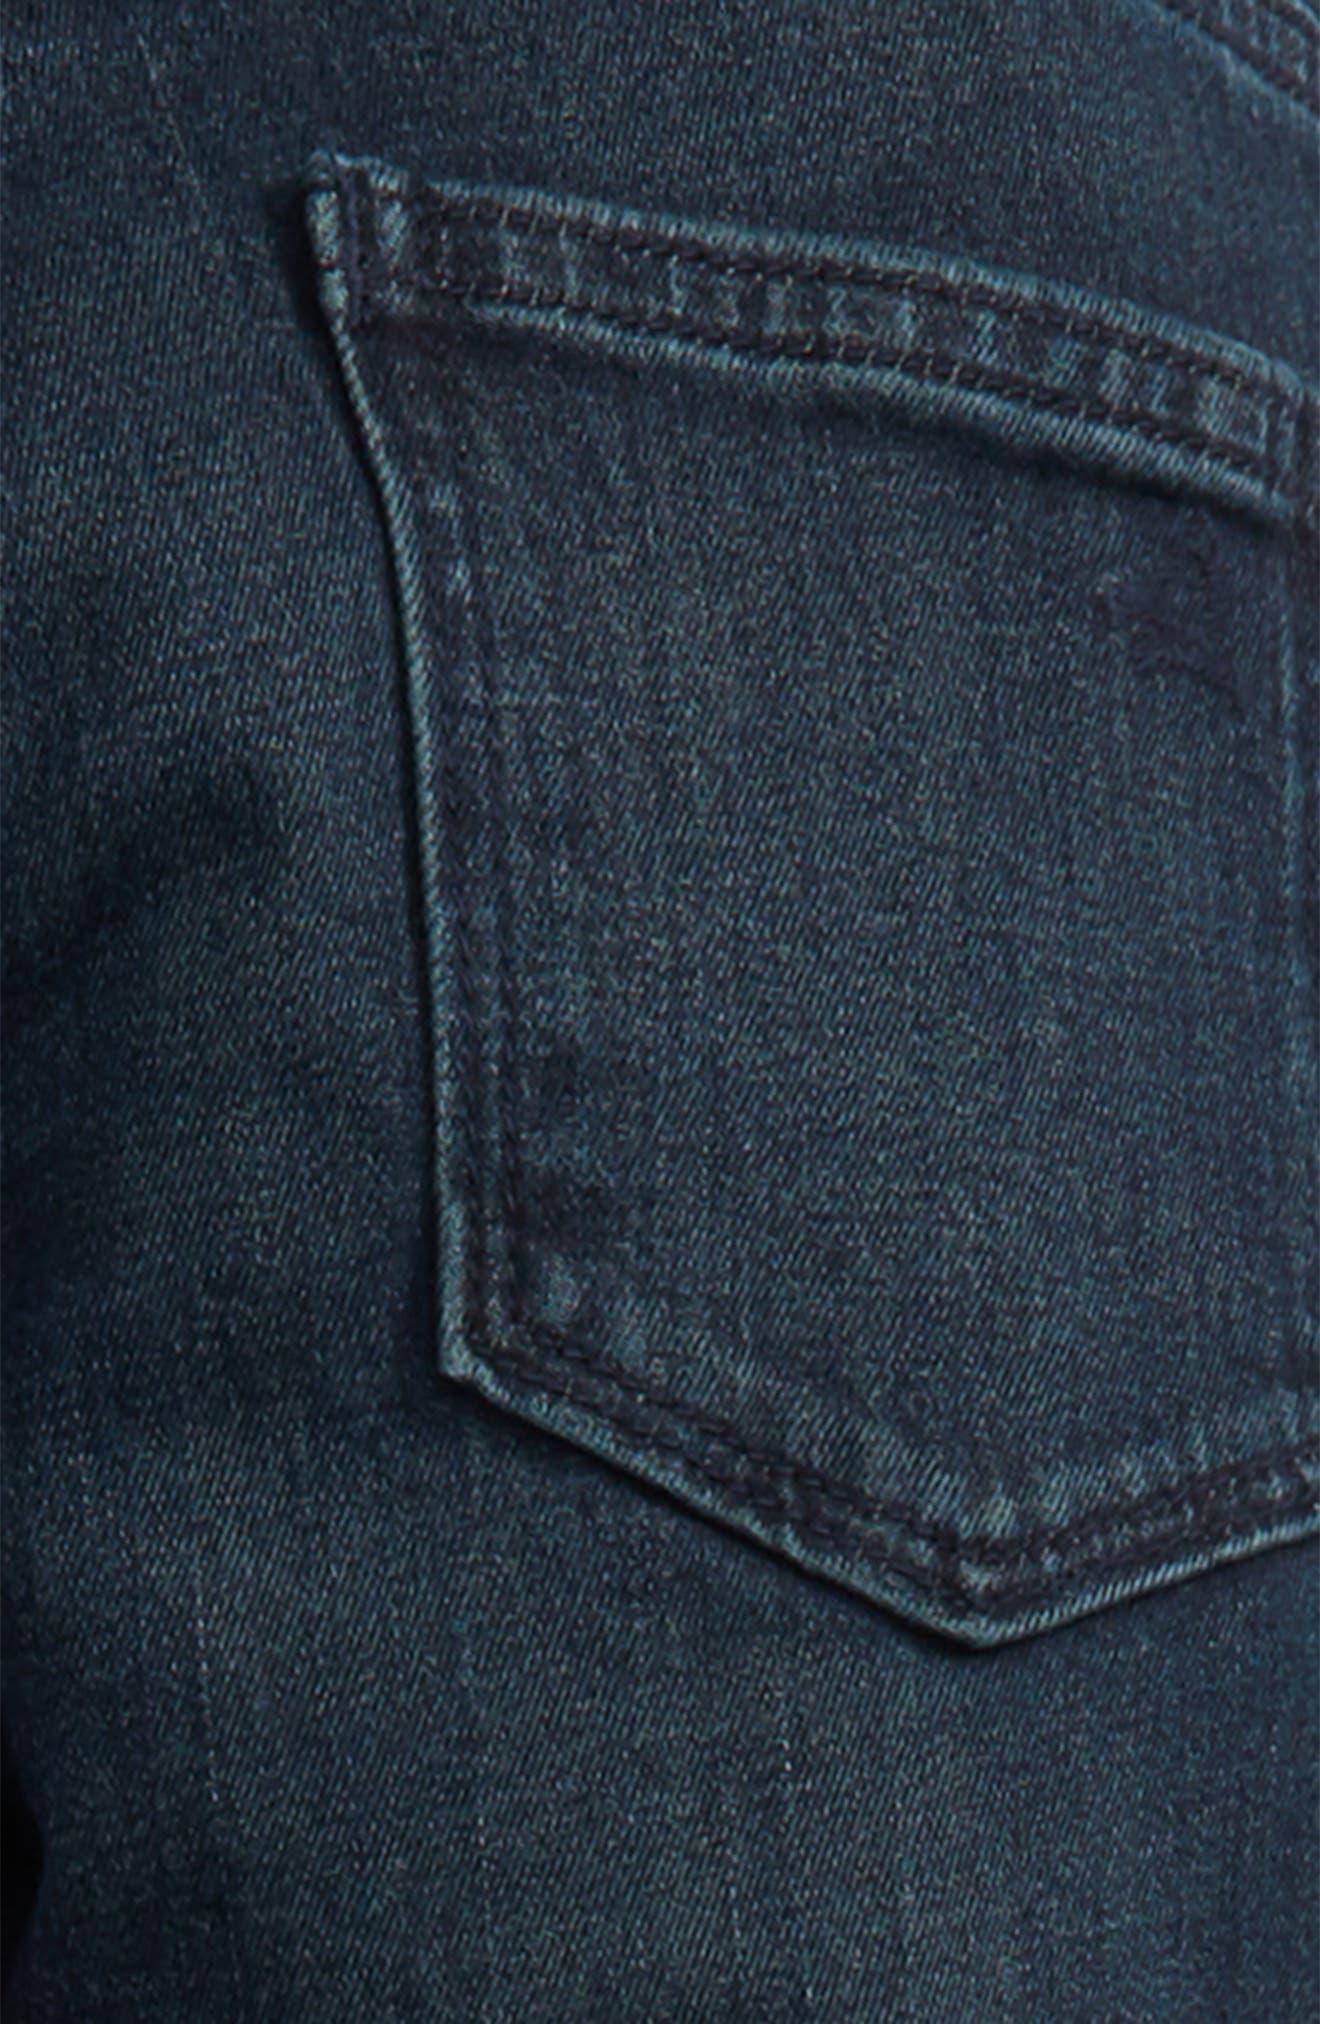 Alternate Image 3  - DL1961 Brady Slim Fit Jeans (Big Boys)